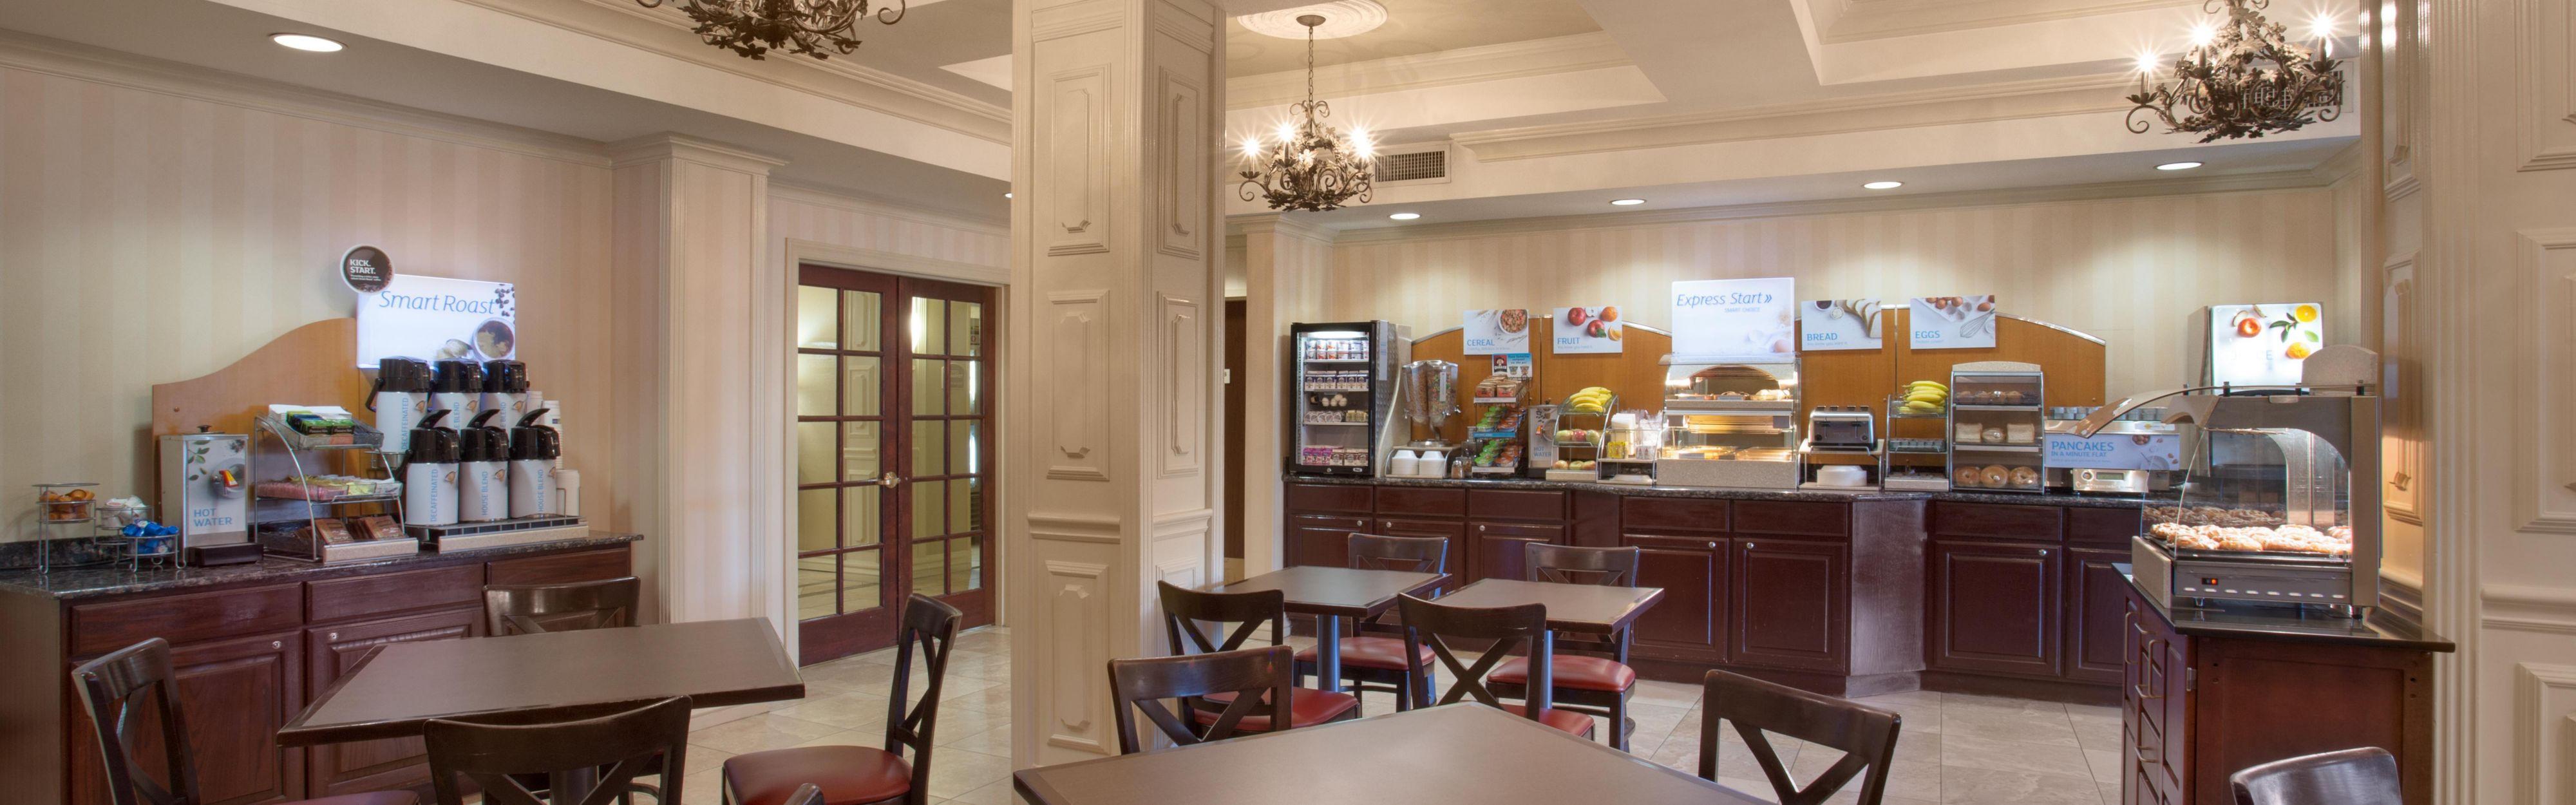 Holiday Inn Express & Suites Phoenix Downtown - Ballpark image 3